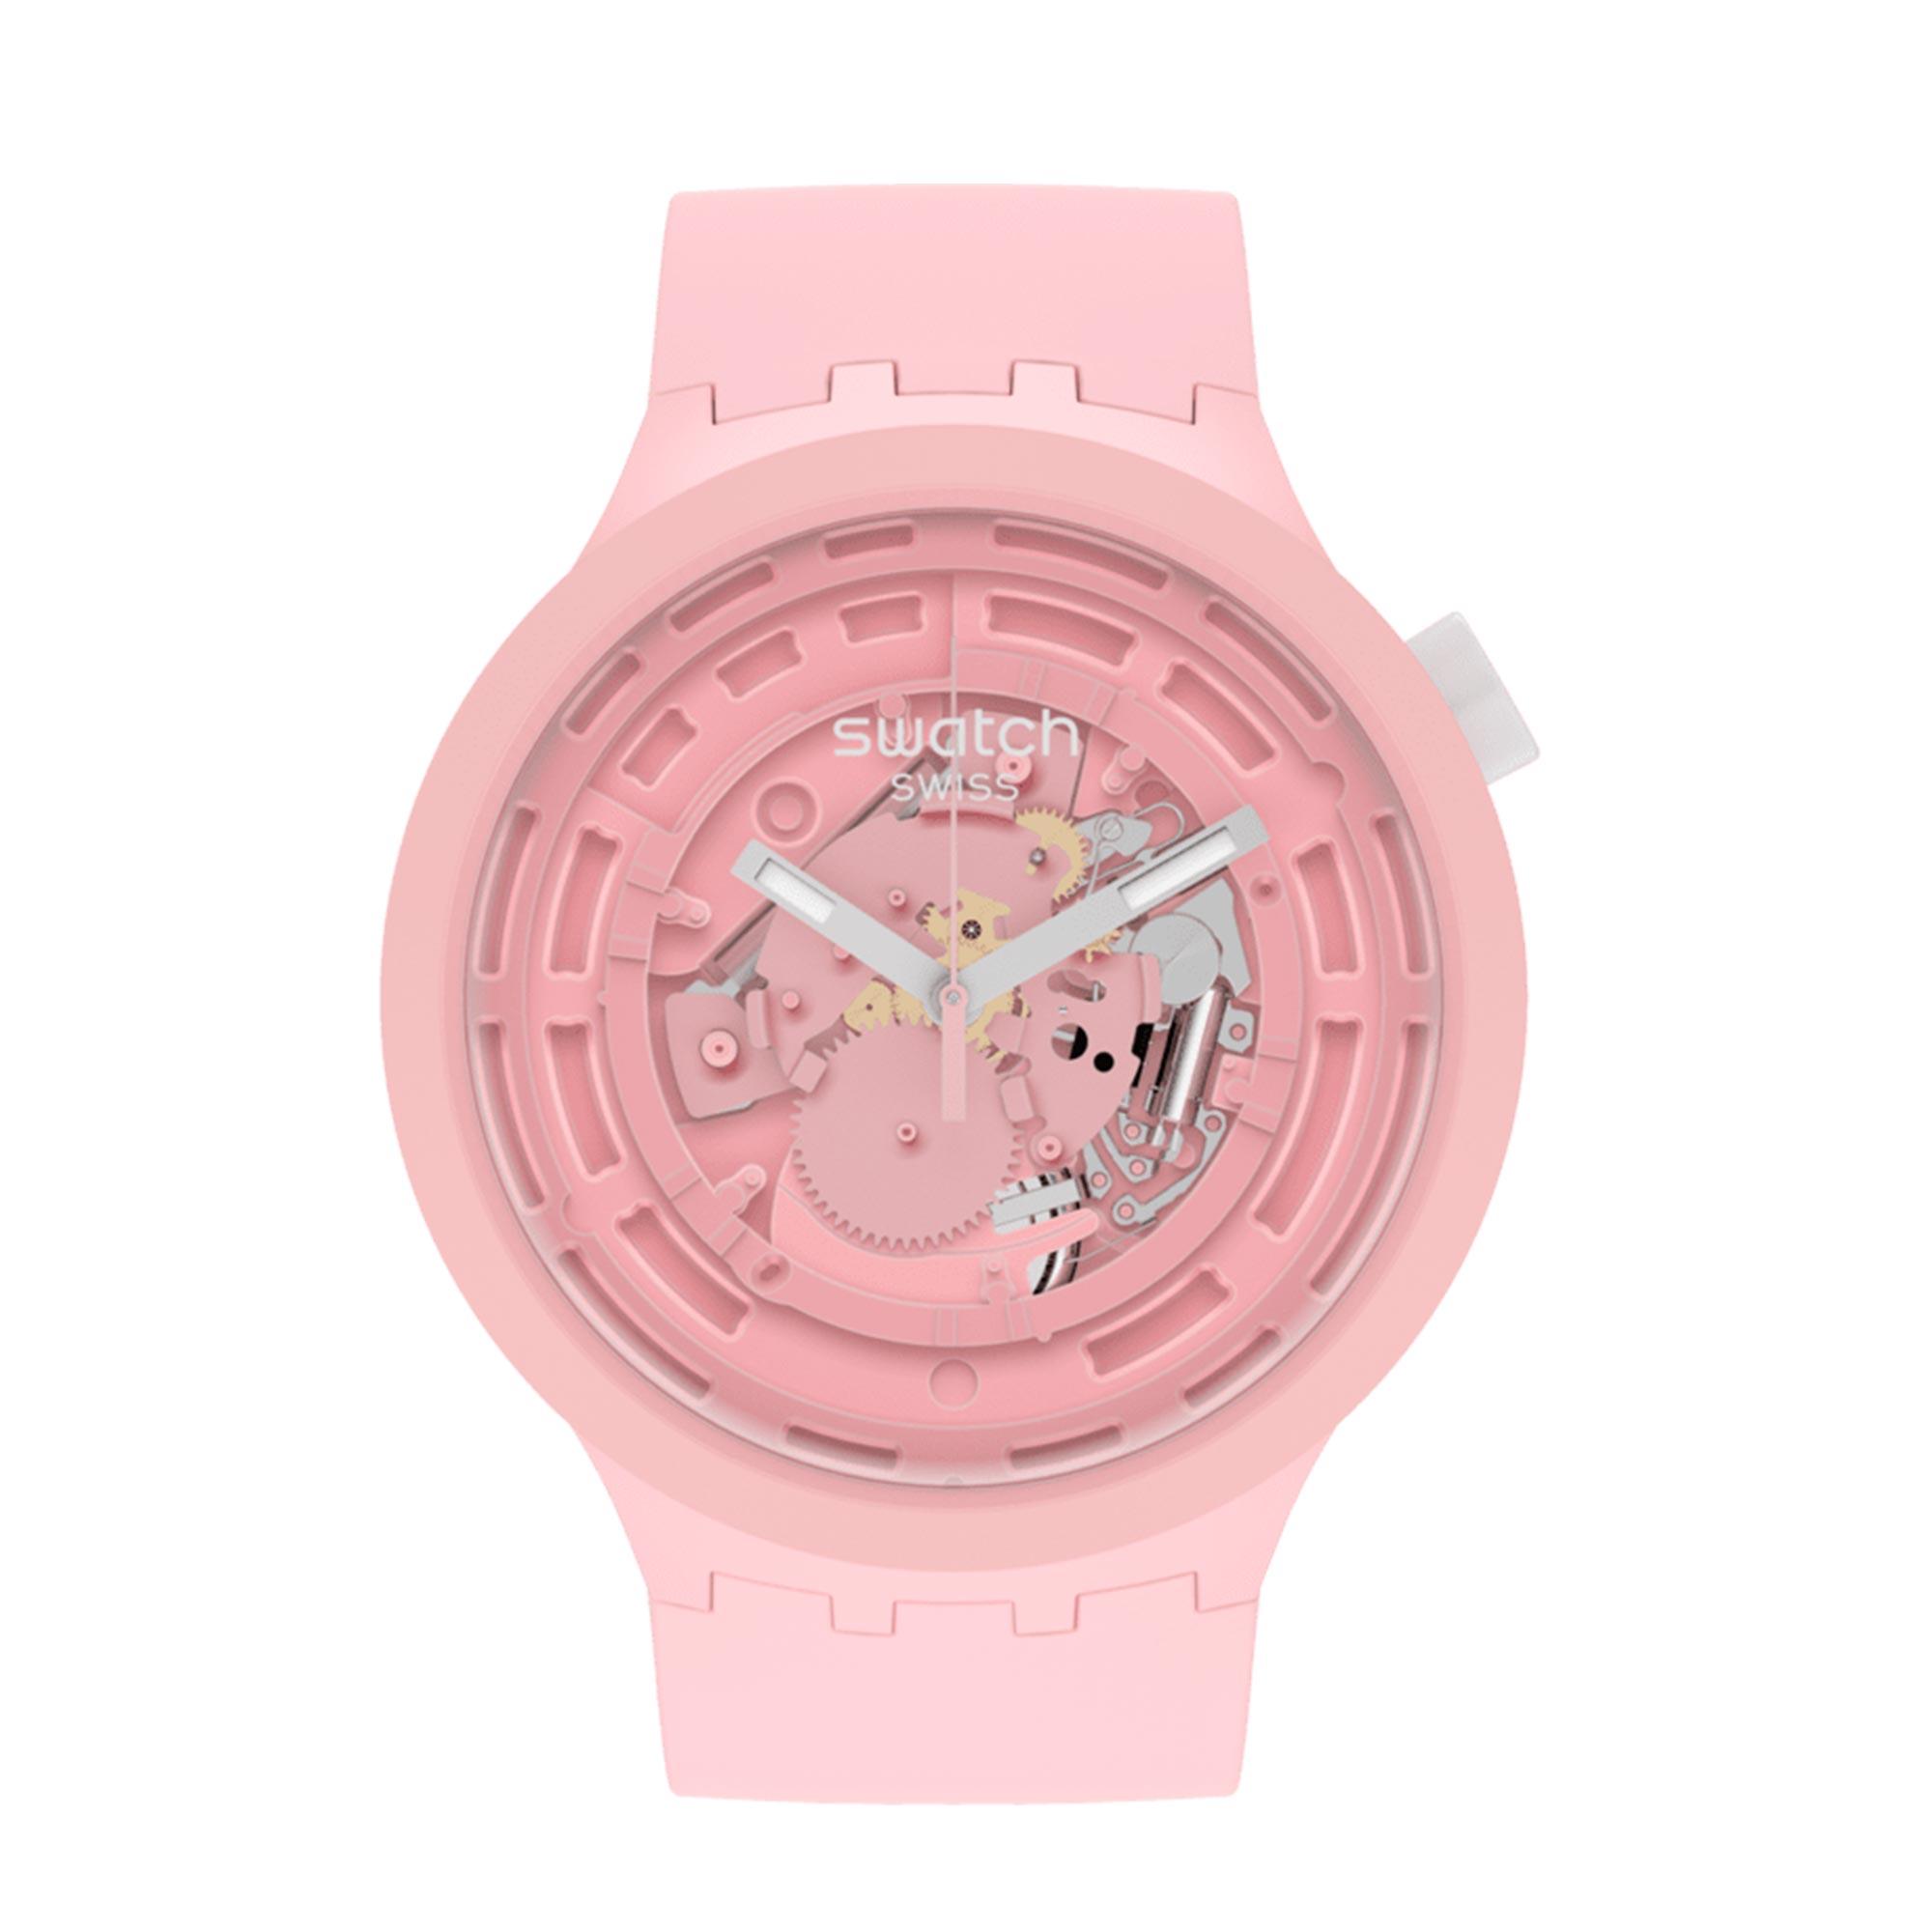 Swatch Big Bold Next Quartz Pink Dial Pink Silicone Strap SB03P100